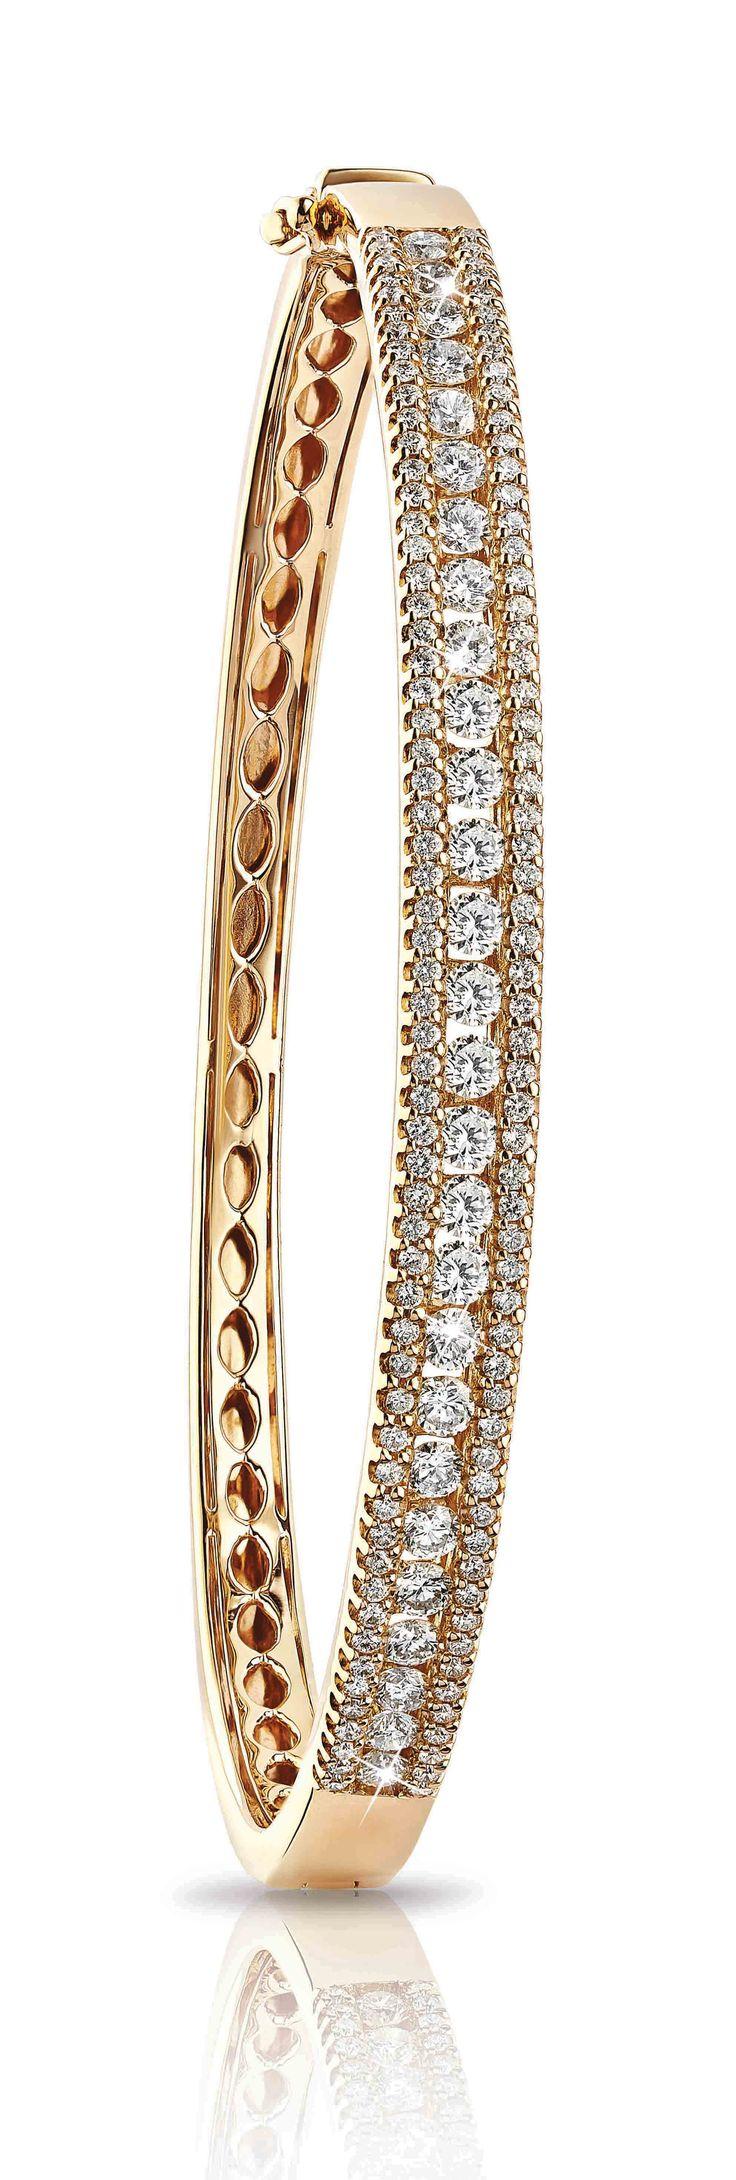 Rosamaria G Frangini | High Diamond Jewellery |